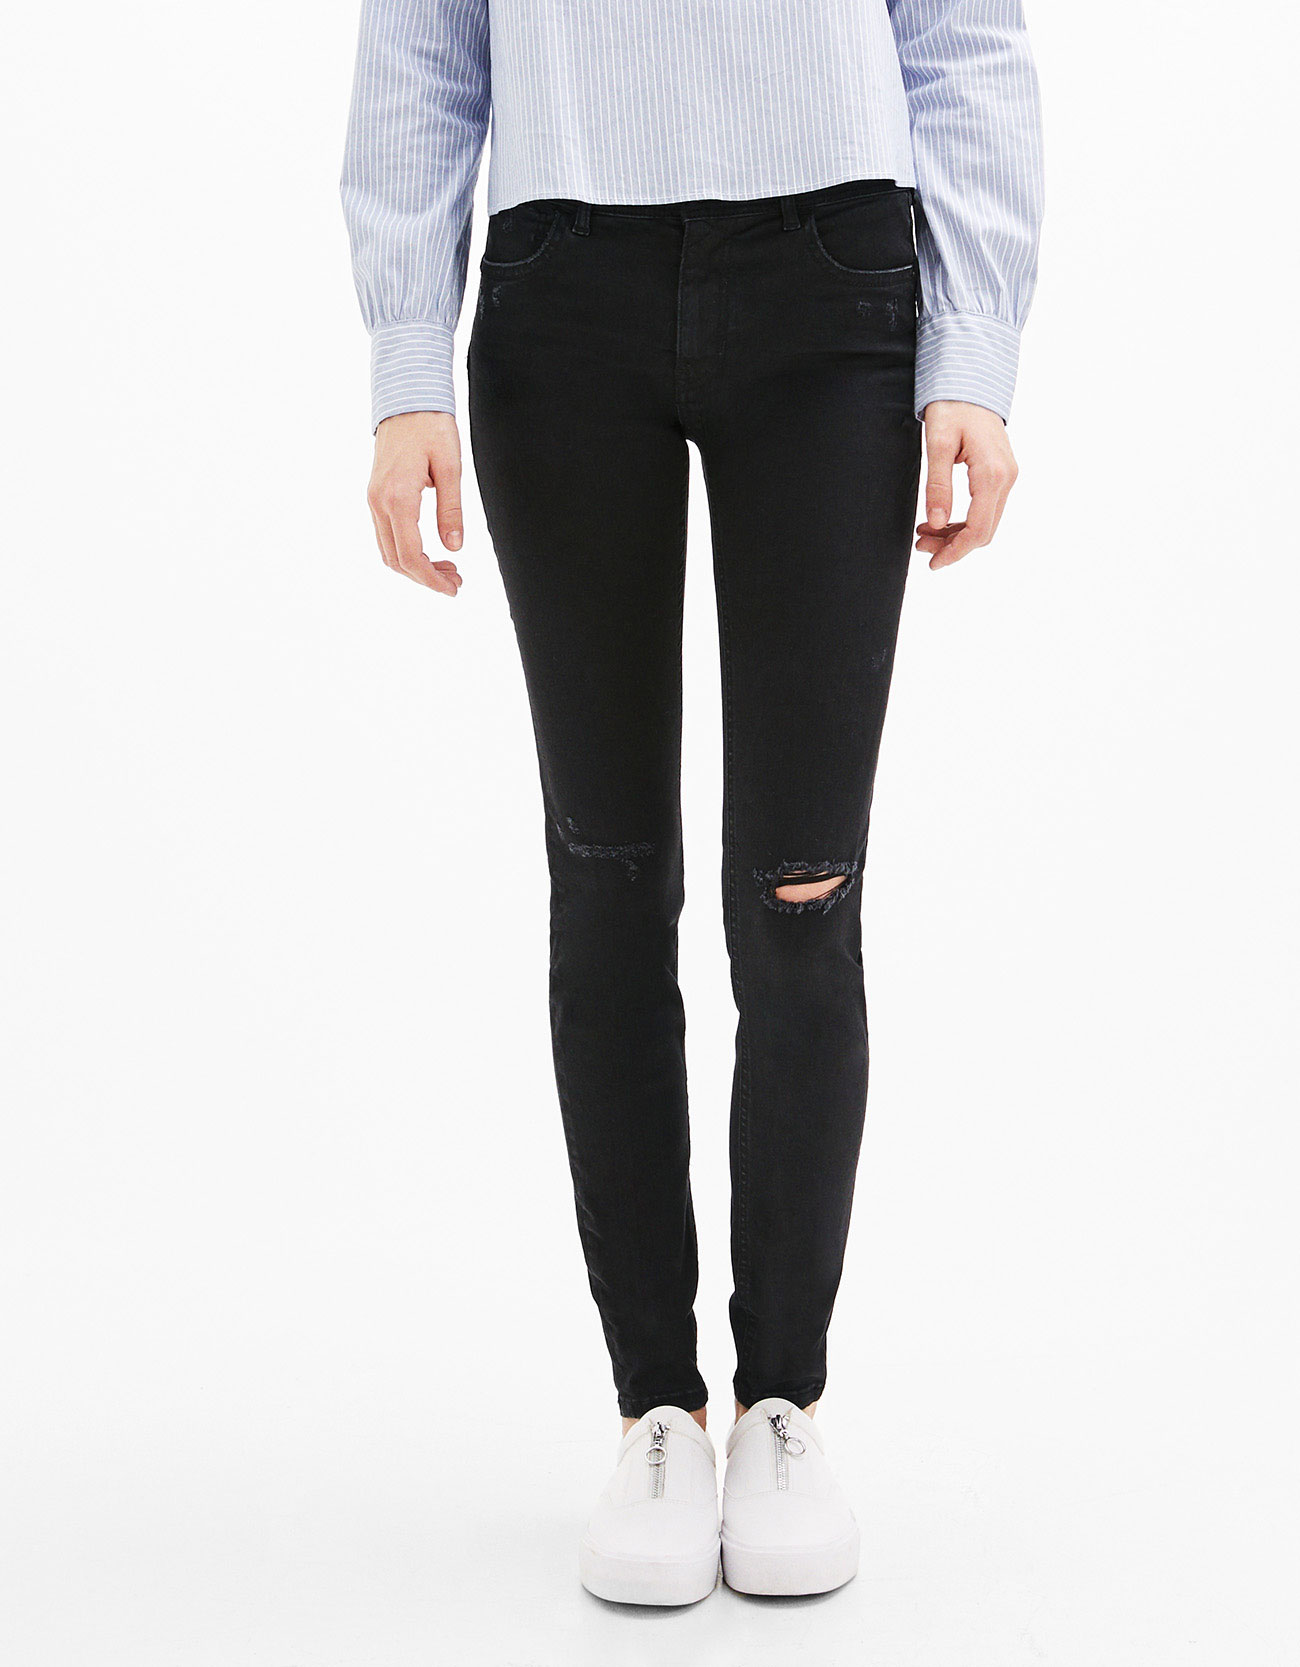 Ripped Push-up Jeans - Skinny - Bershka Japan